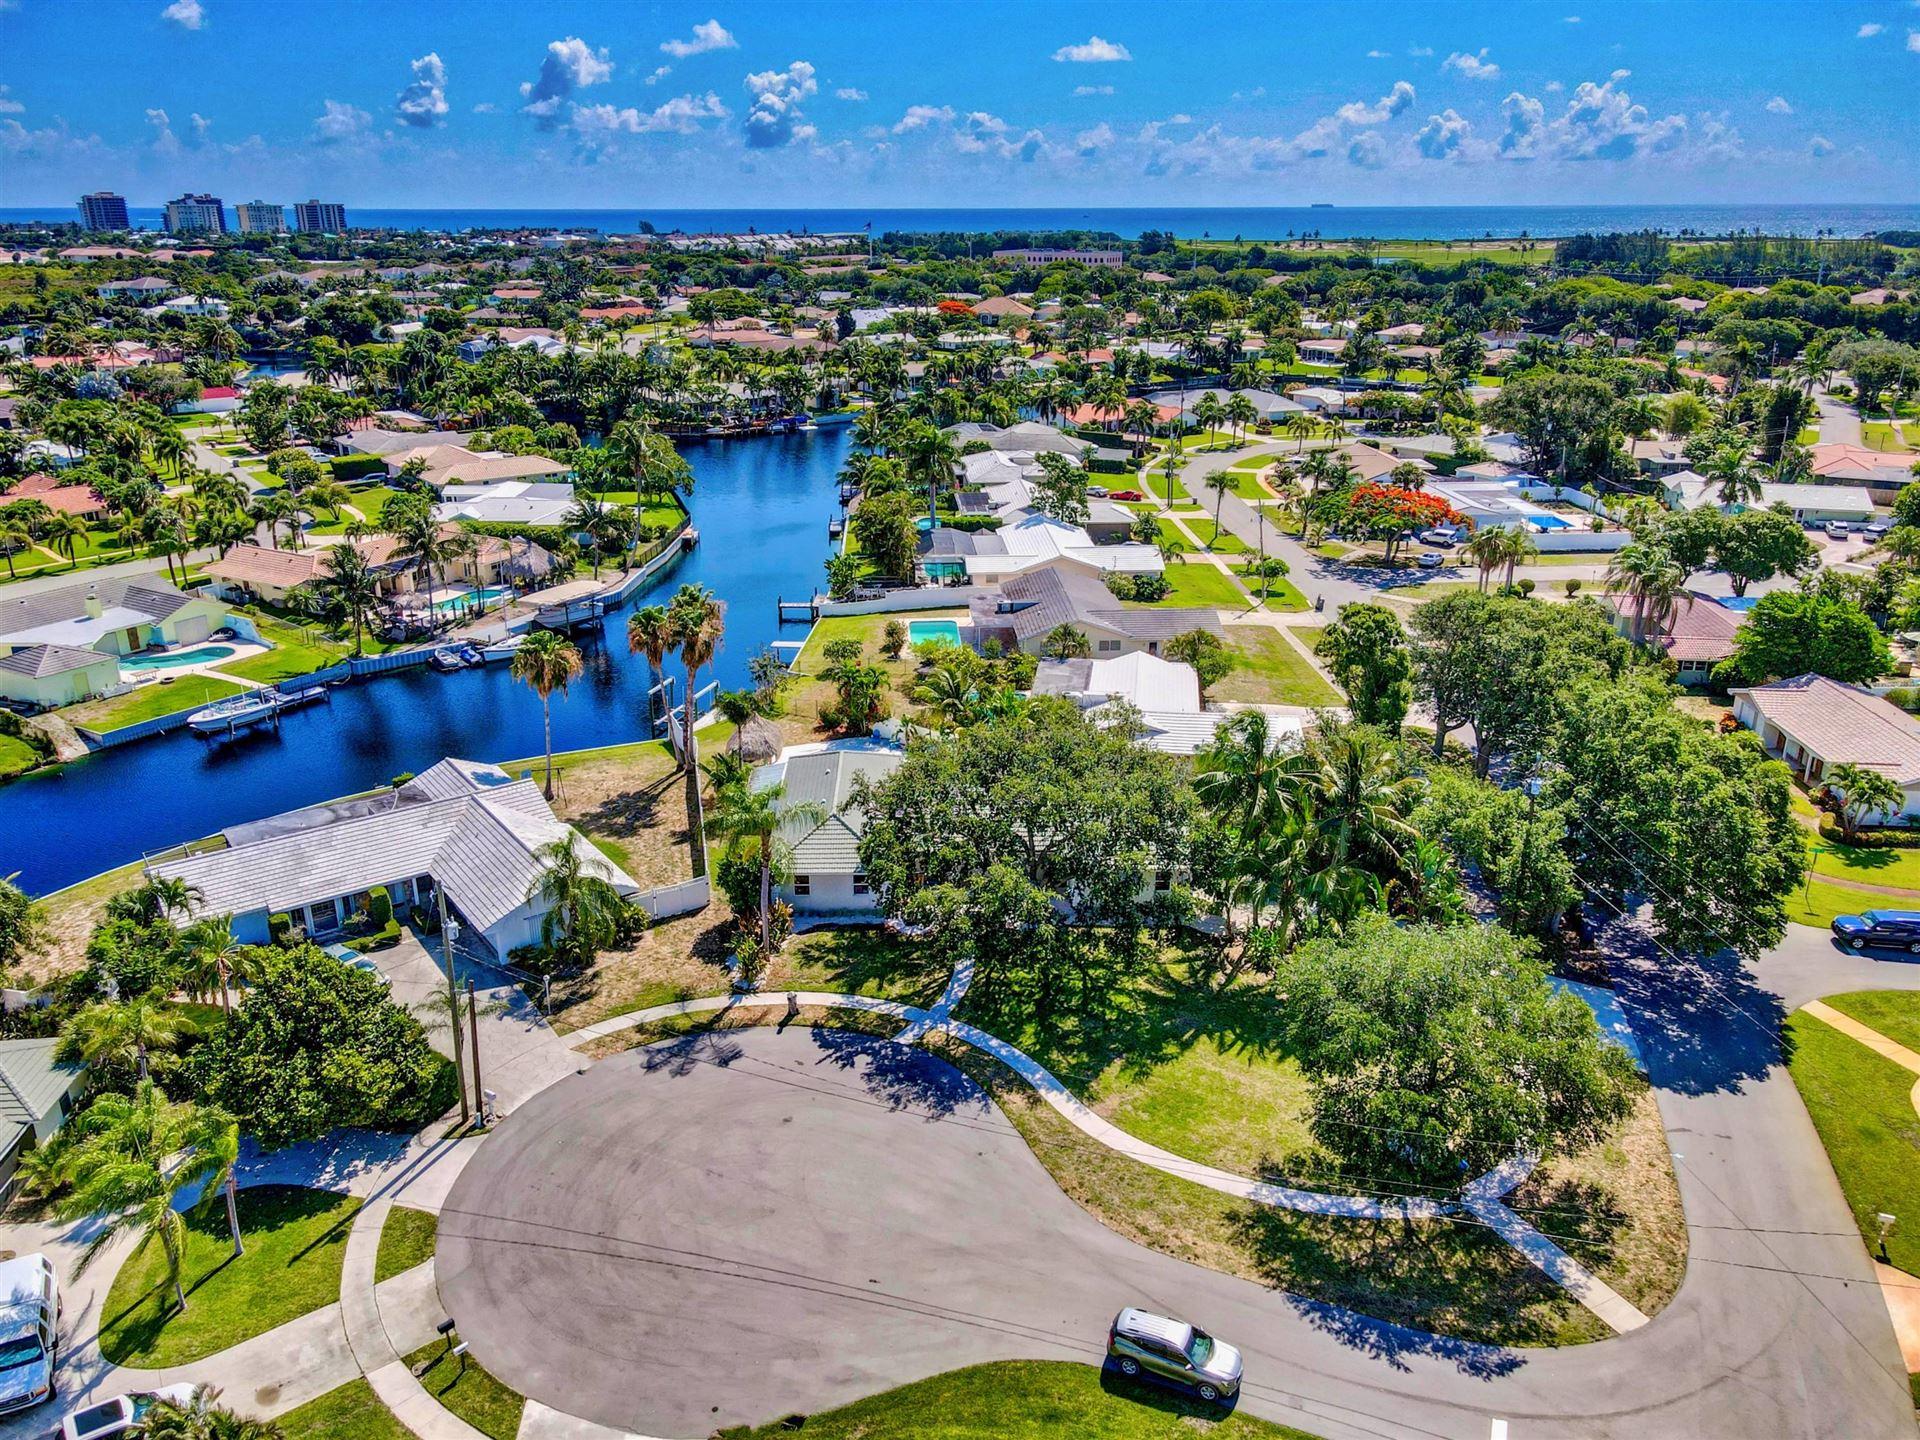 Photo of 1831 Ardley Circle, North Palm Beach, FL 33408 (MLS # RX-10723516)